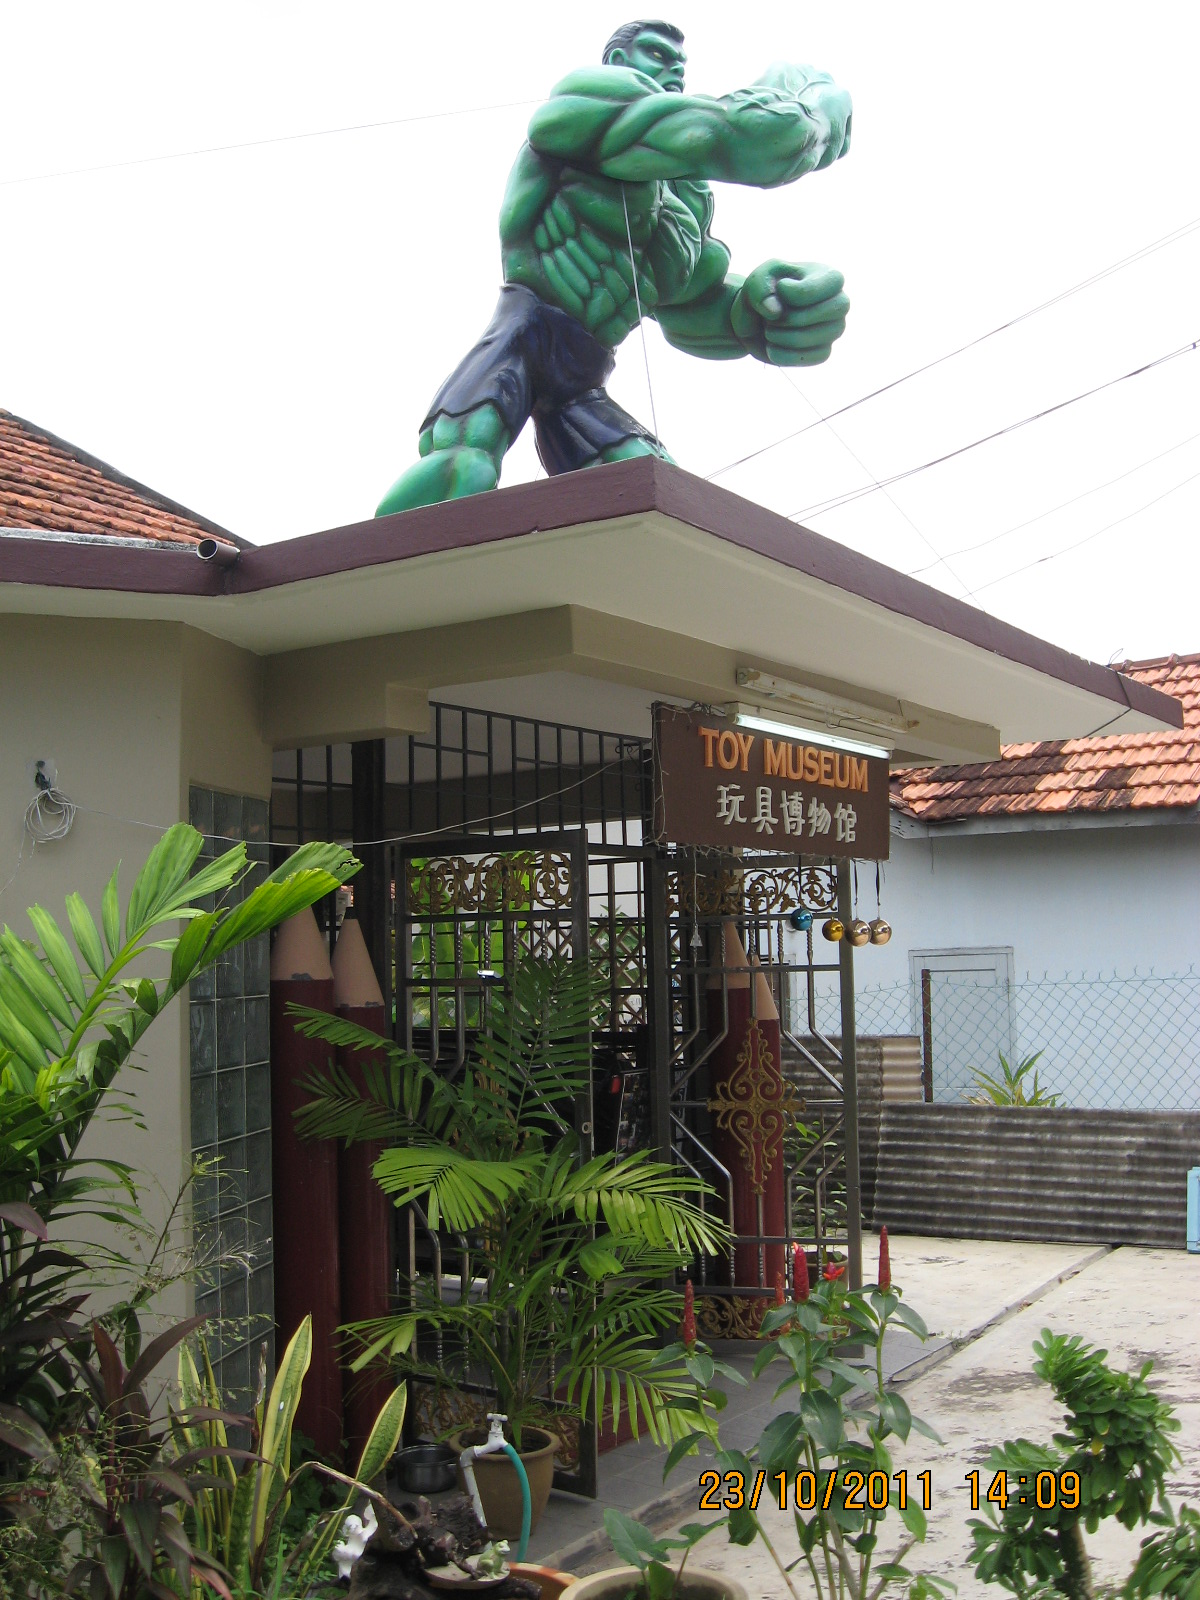 Toy Museum Melaka: Address, Phone Number, Toy Museum Melaka Reviews: 5/5